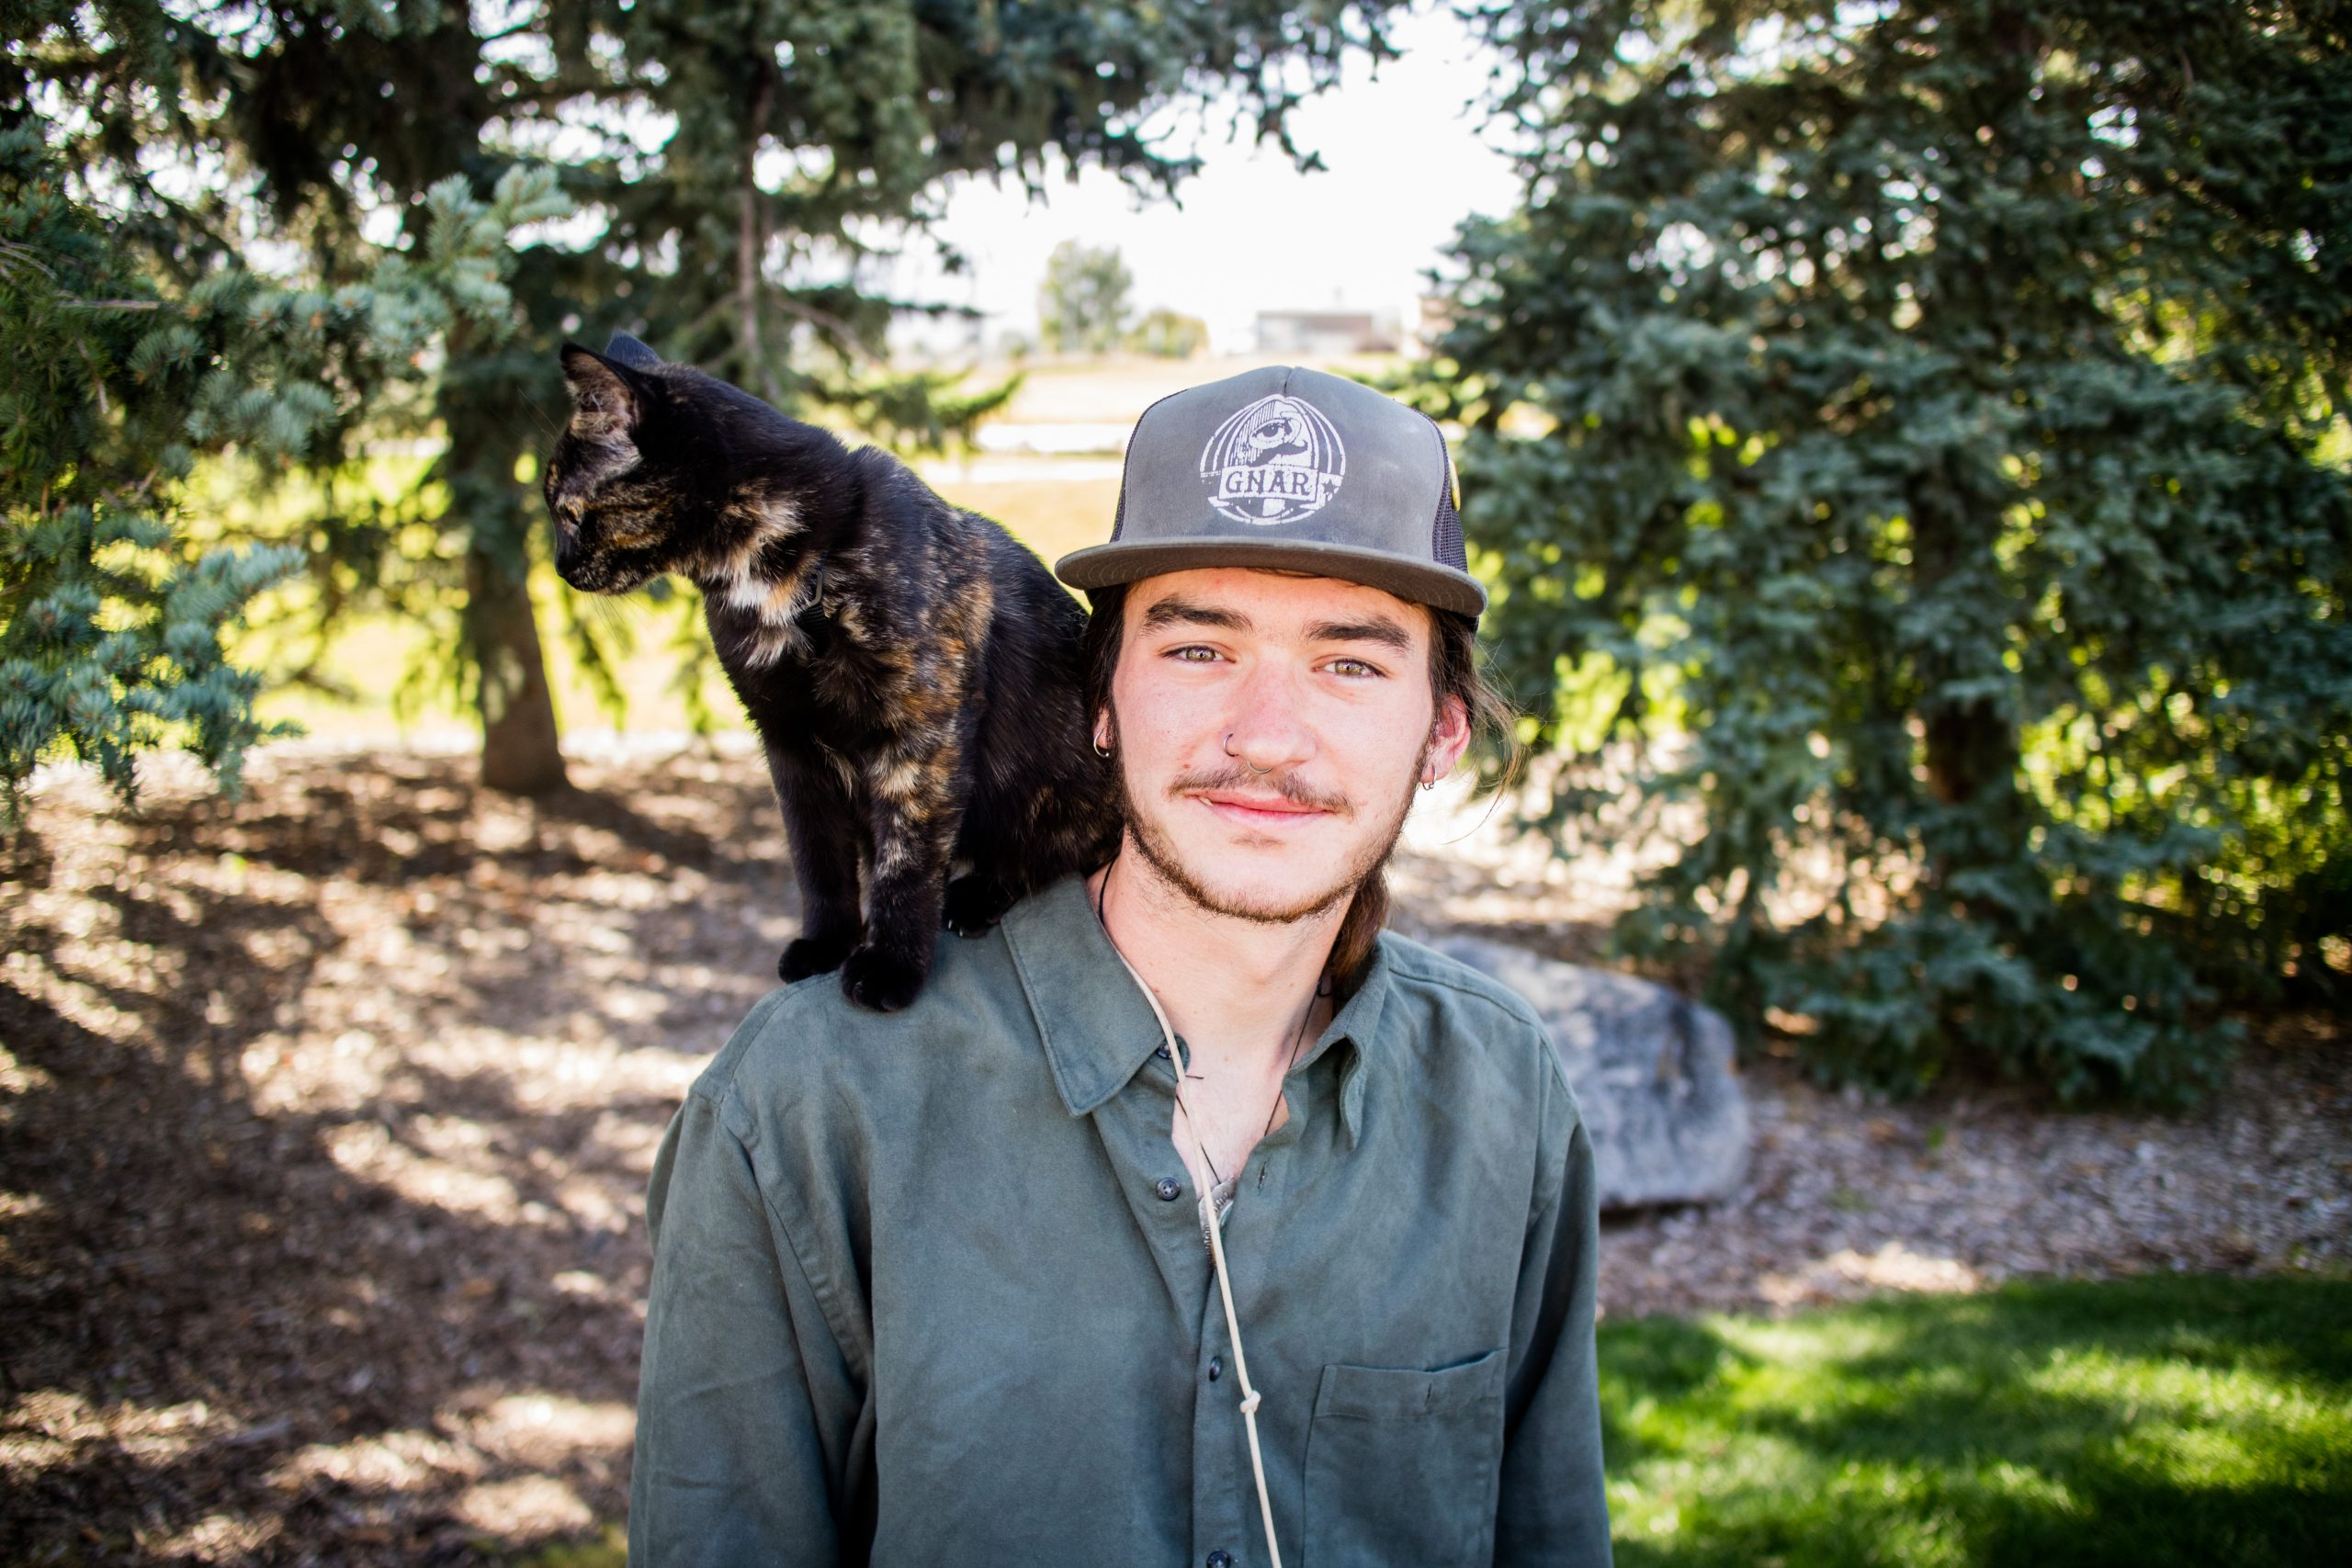 Firefighter returns to CSU, adopts cat